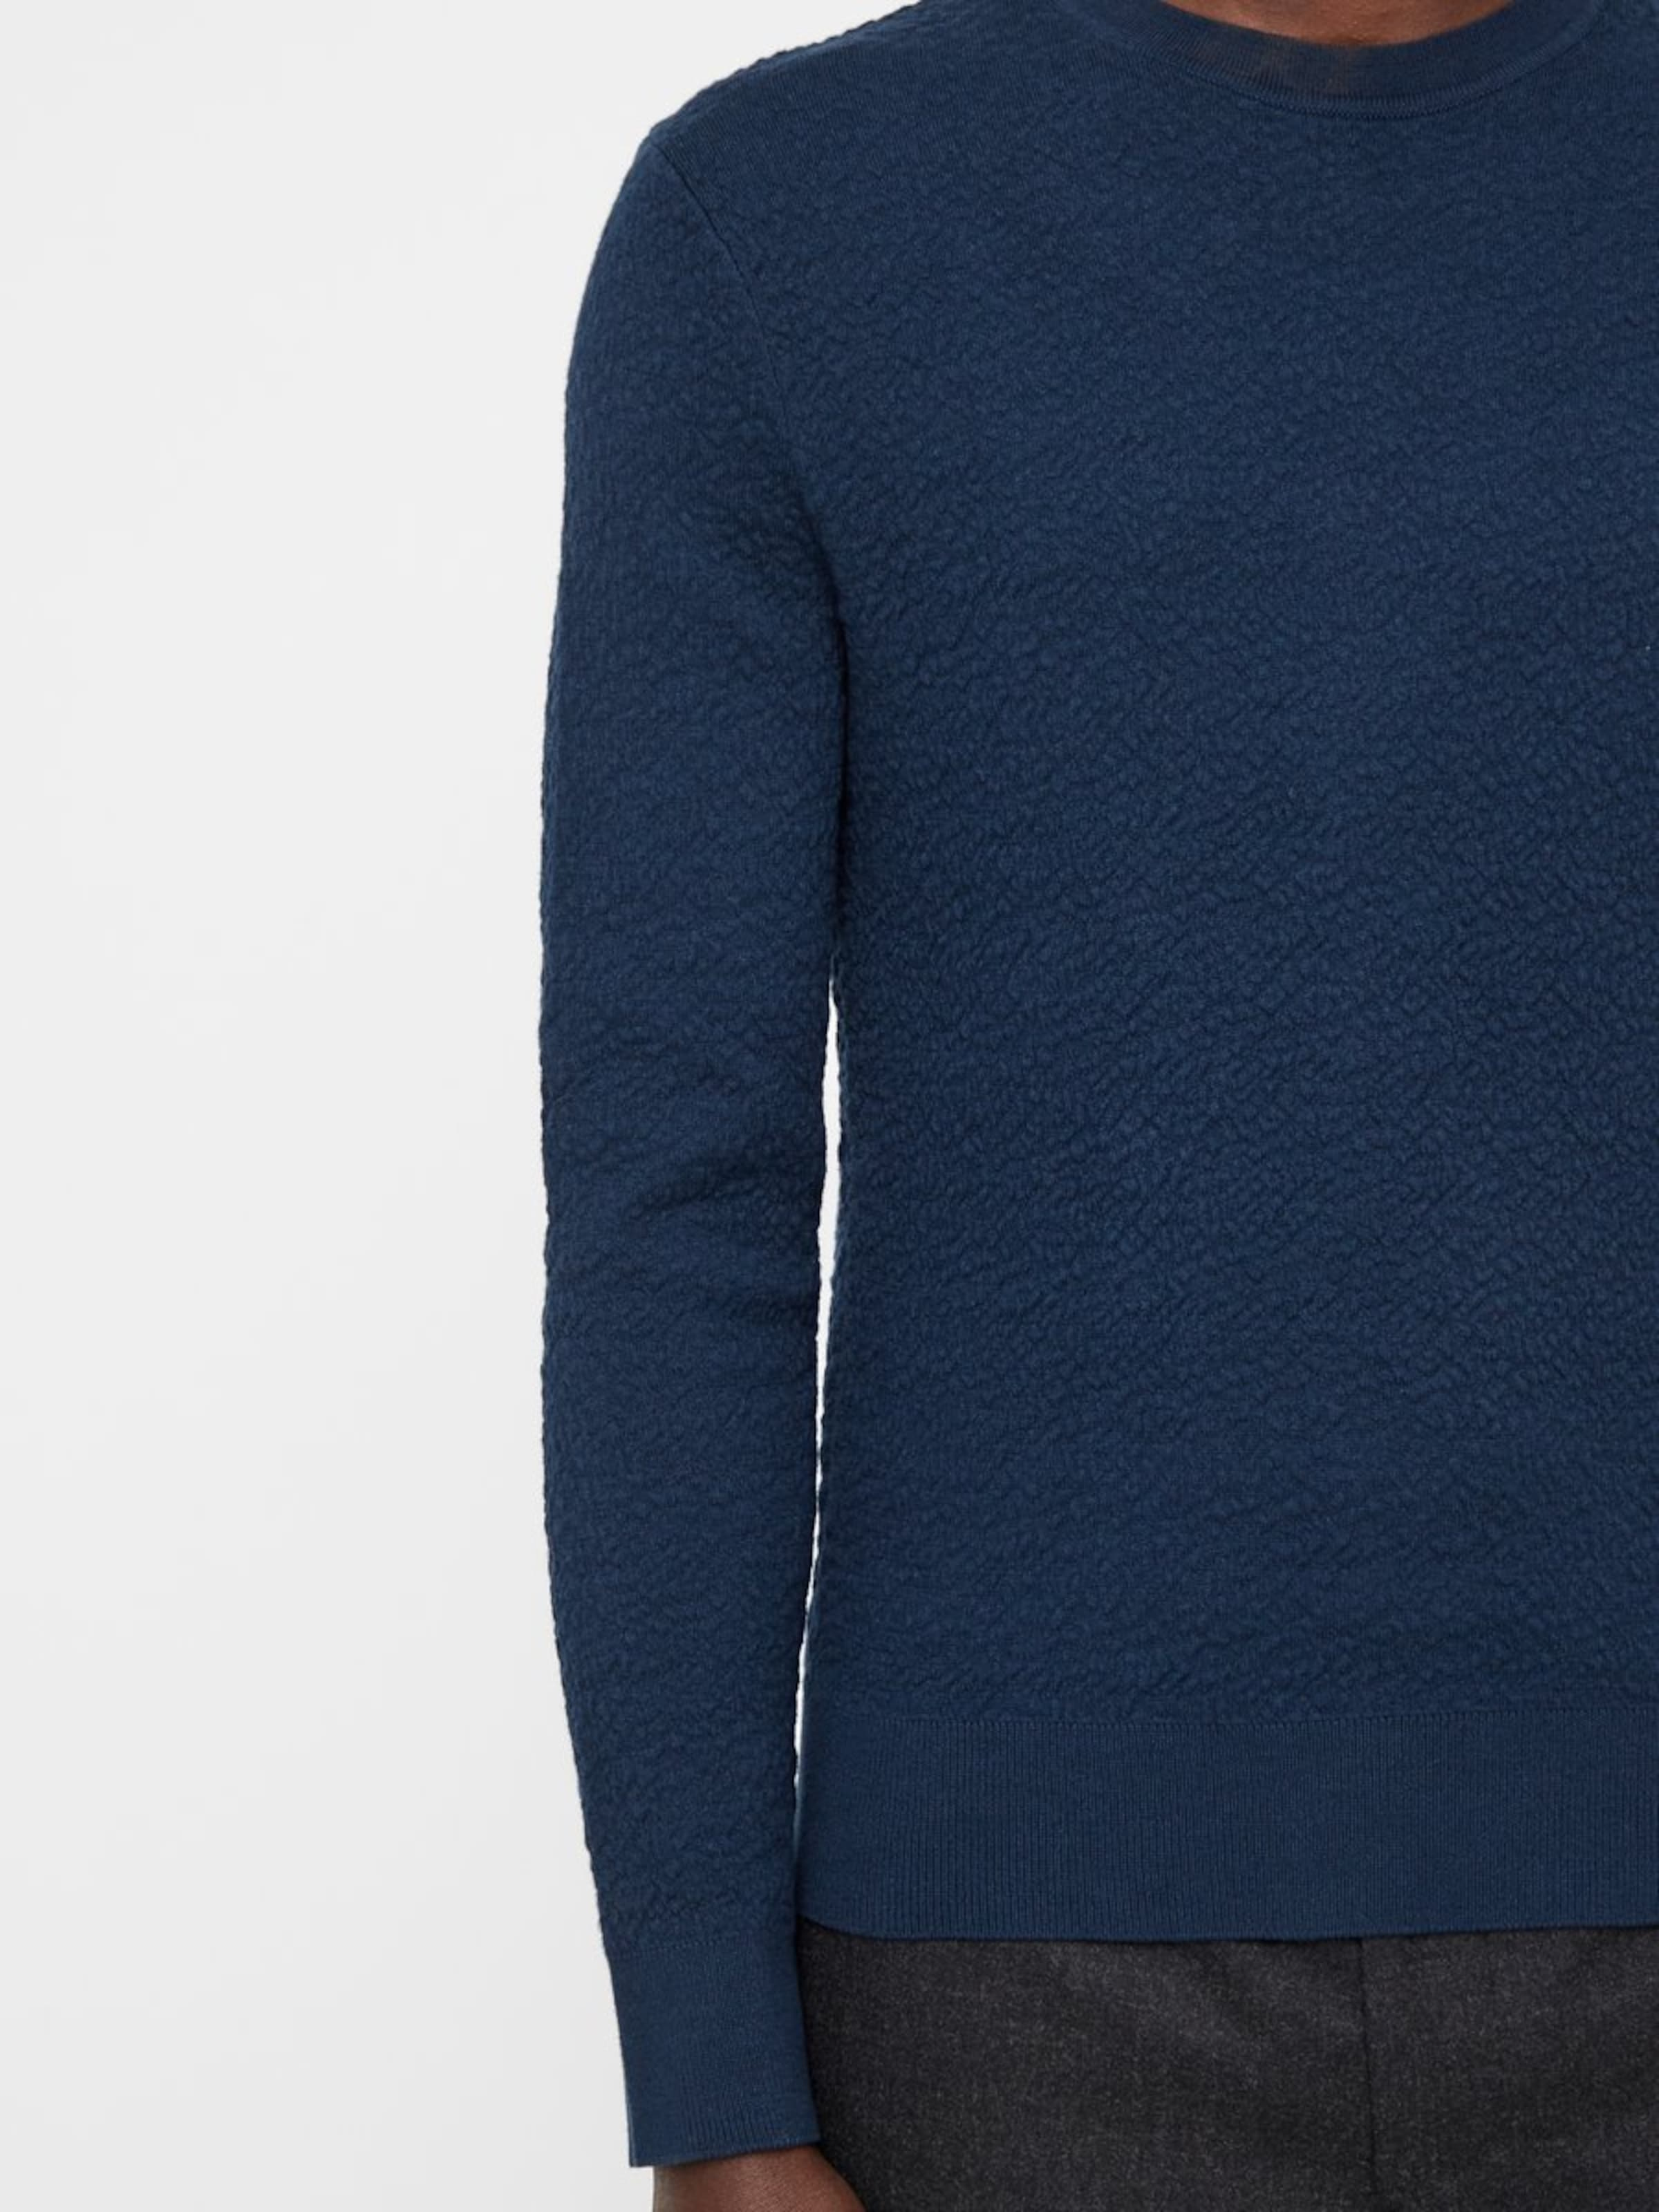 'taylon' Navy Pullover J lindeberg In gIyY6b7fv